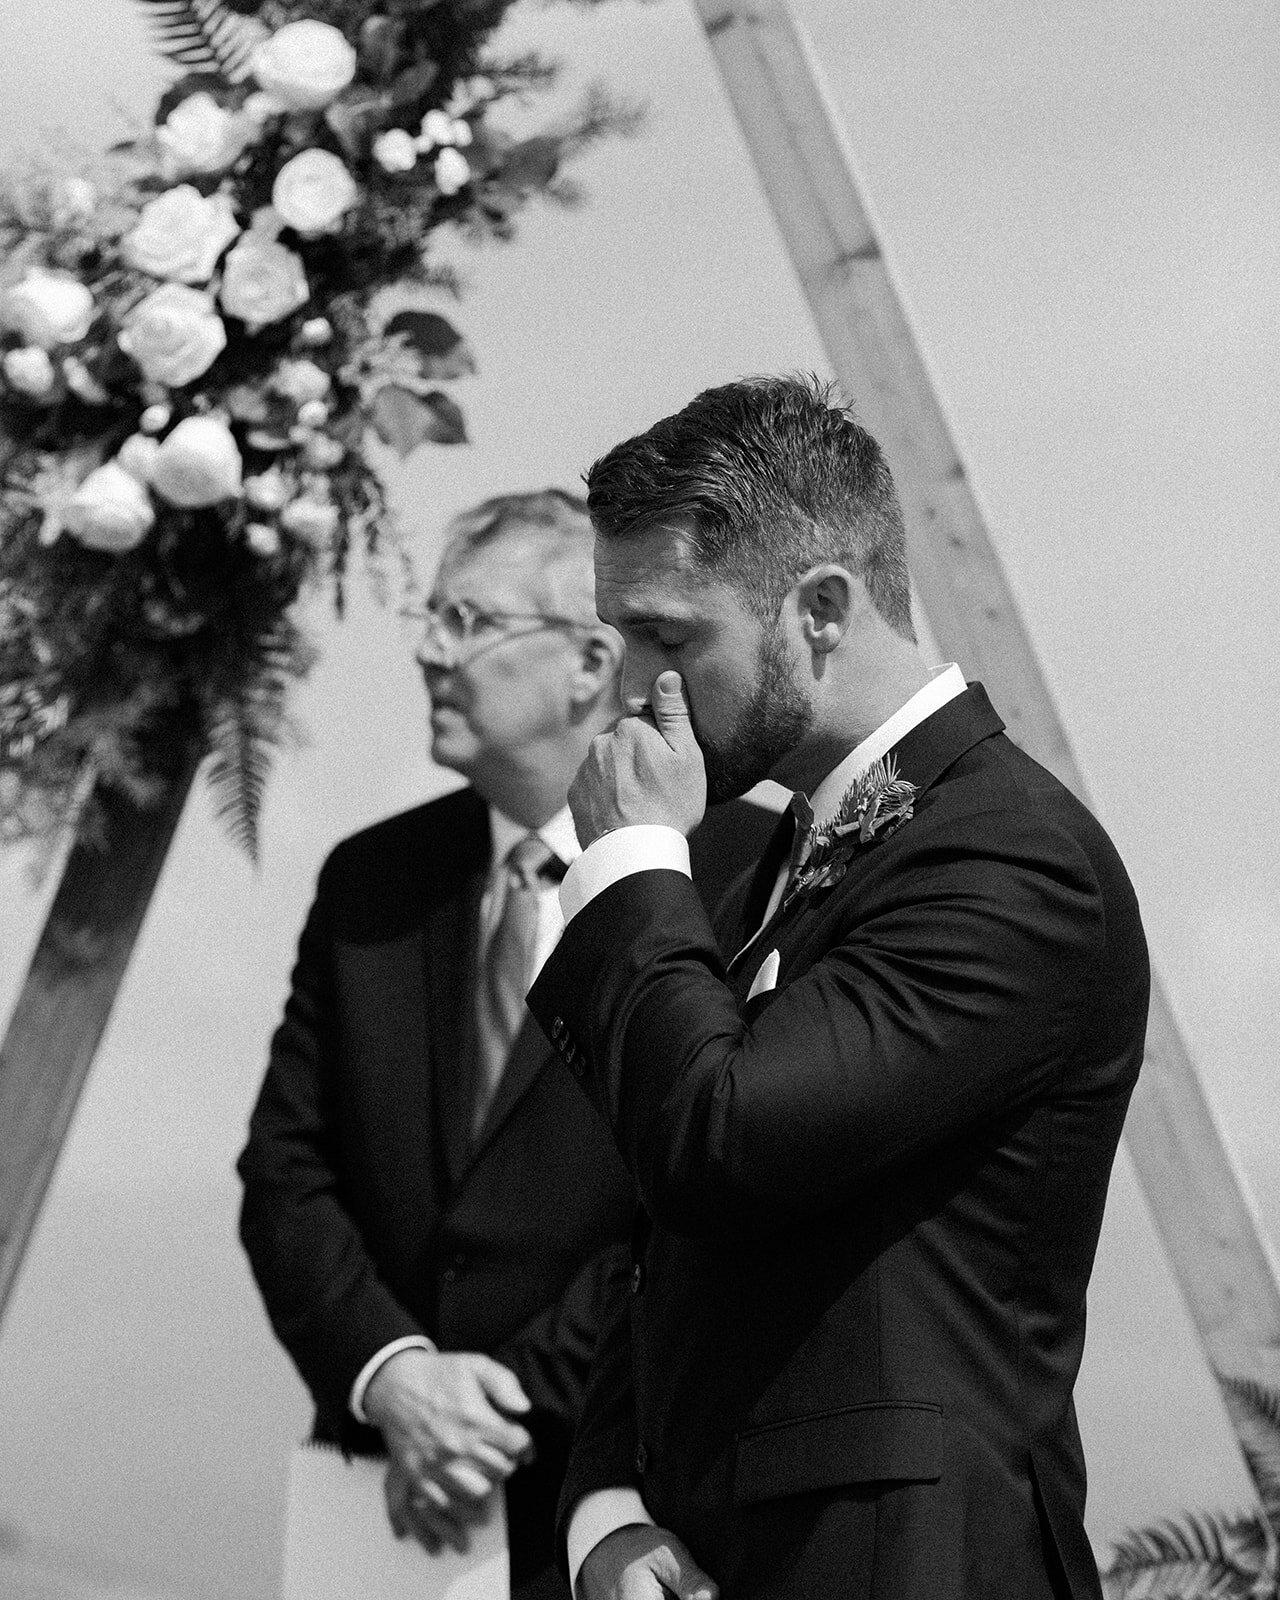 bride and groom first look in ceremony spokane wedding